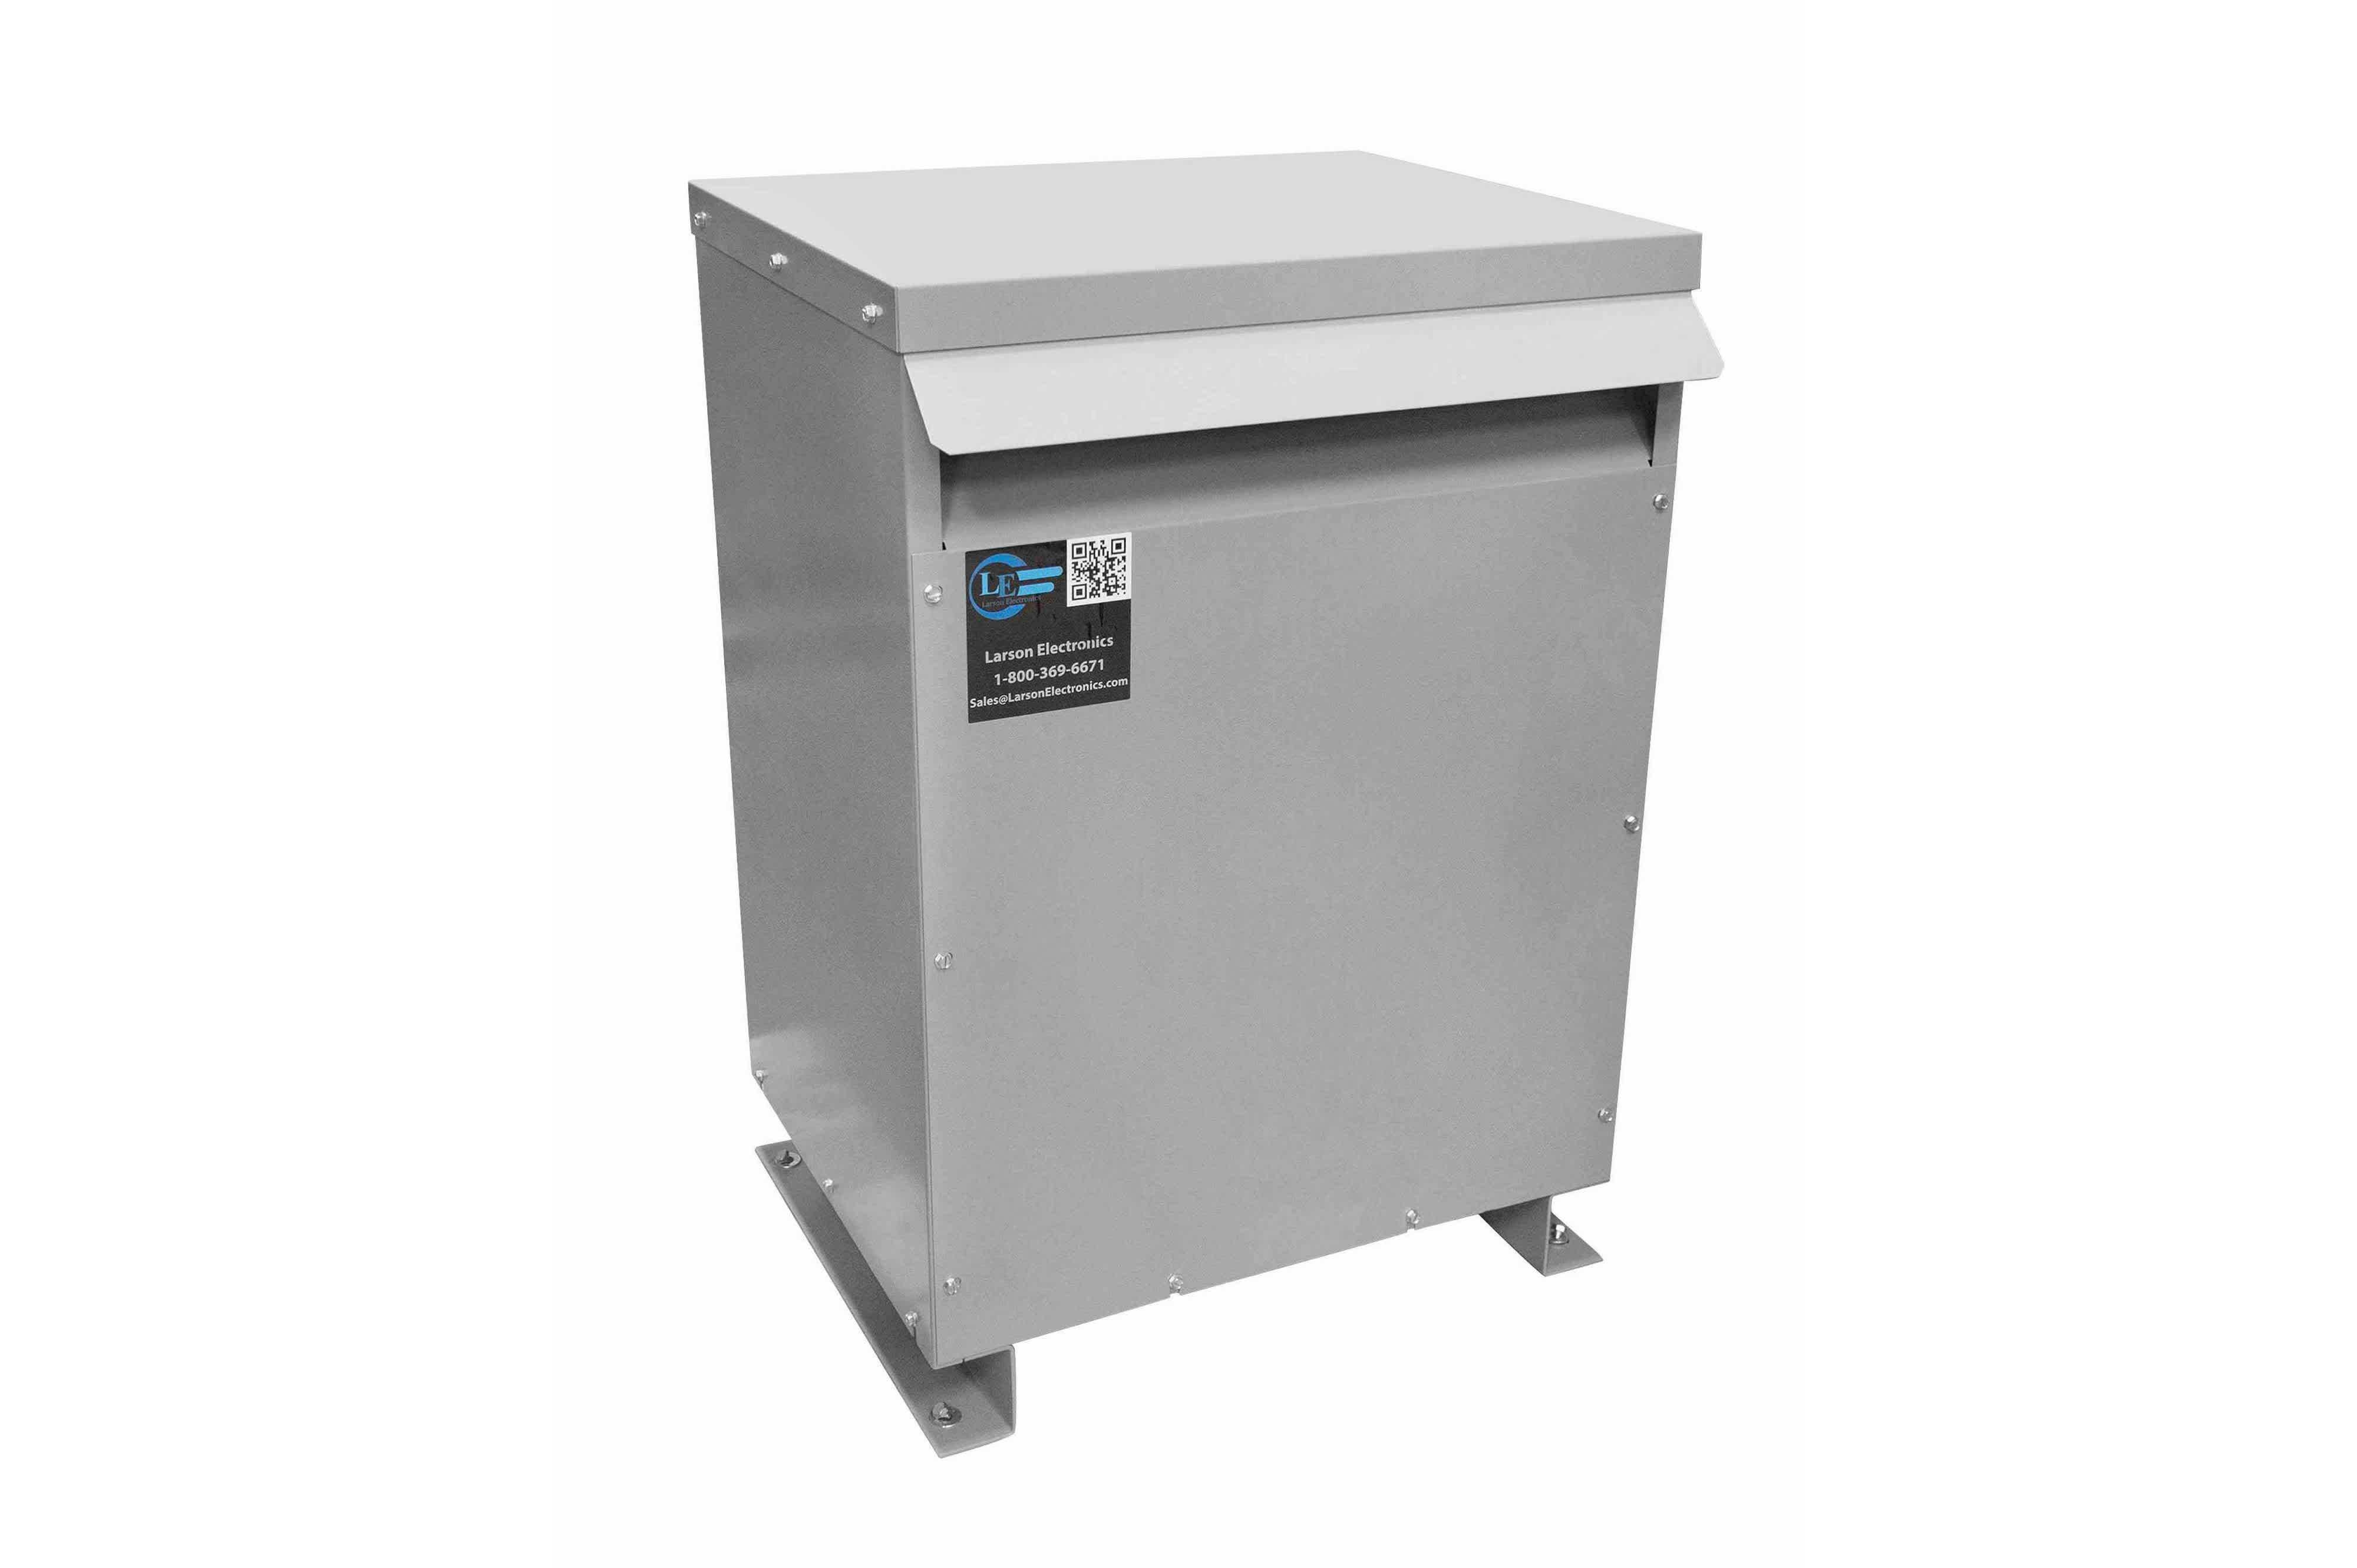 26 kVA 3PH Isolation Transformer, 380V Wye Primary, 240V/120 Delta Secondary, N3R, Ventilated, 60 Hz